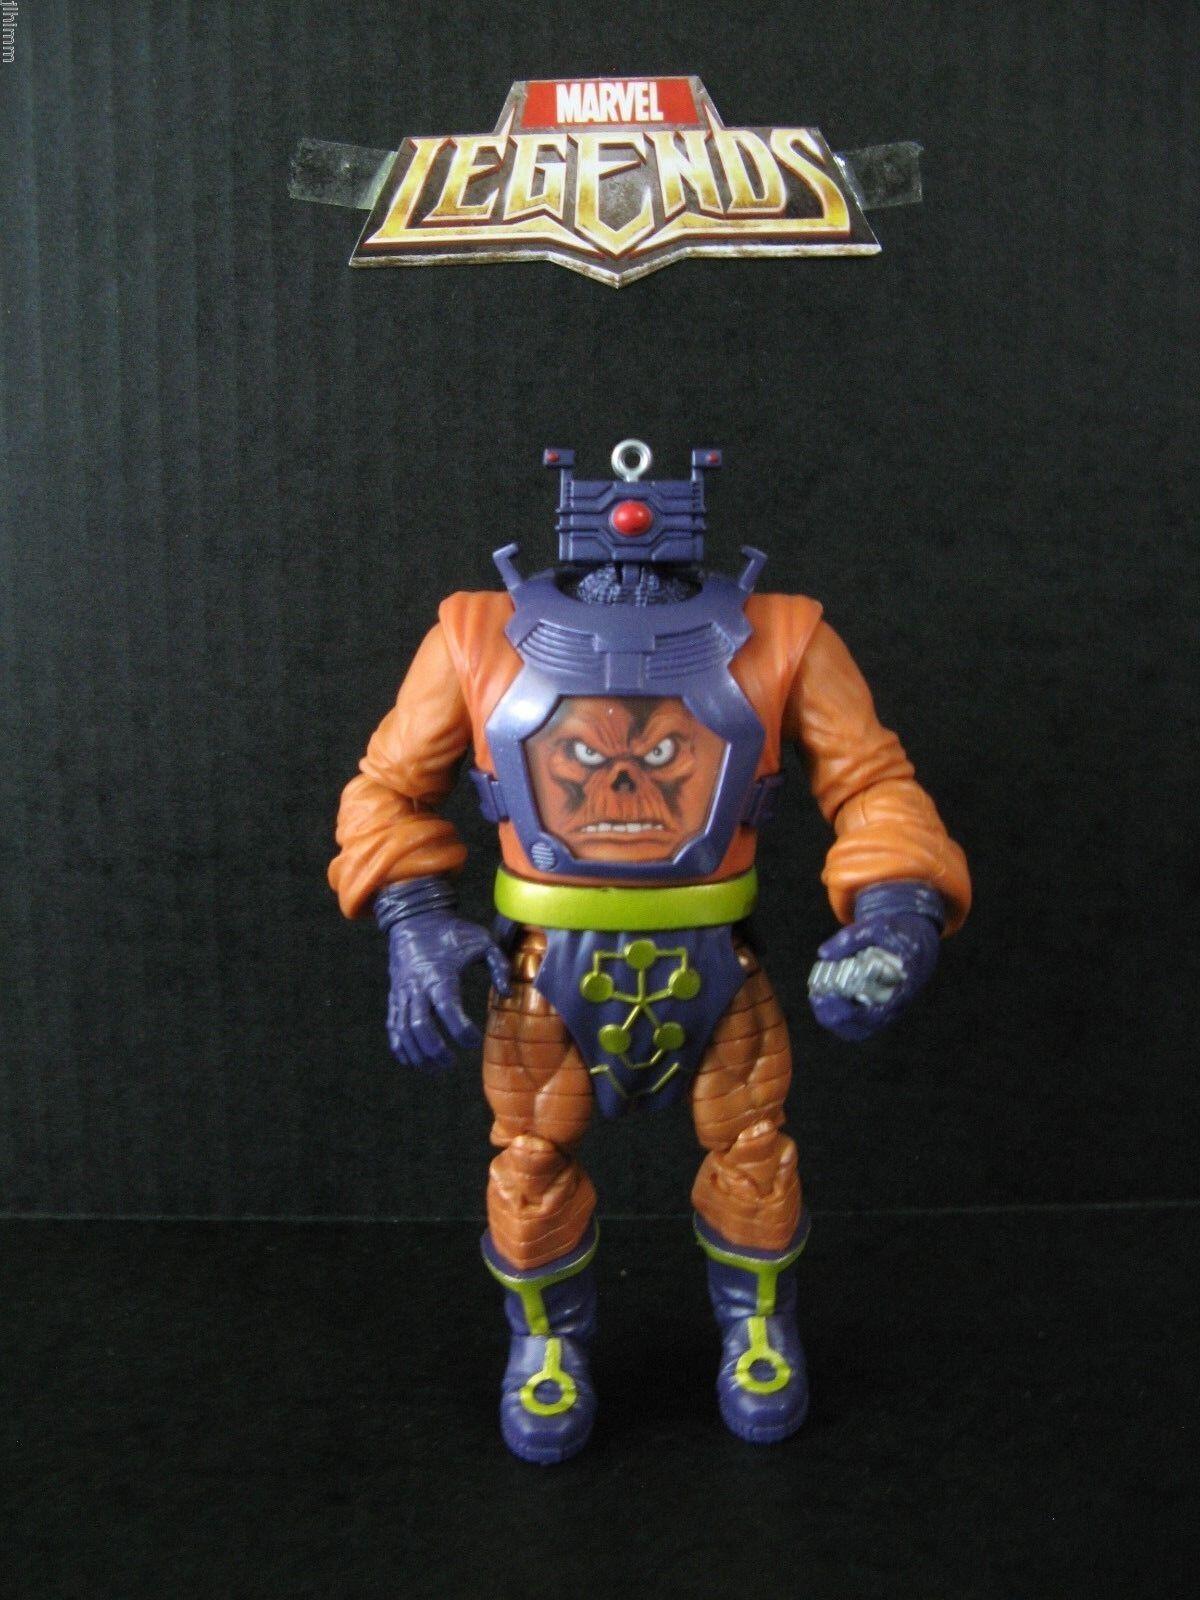 Marvel Legends Arnim Zola  BAF Figure Figure Figure Complete  -  Varaint - Captain America 22ff32